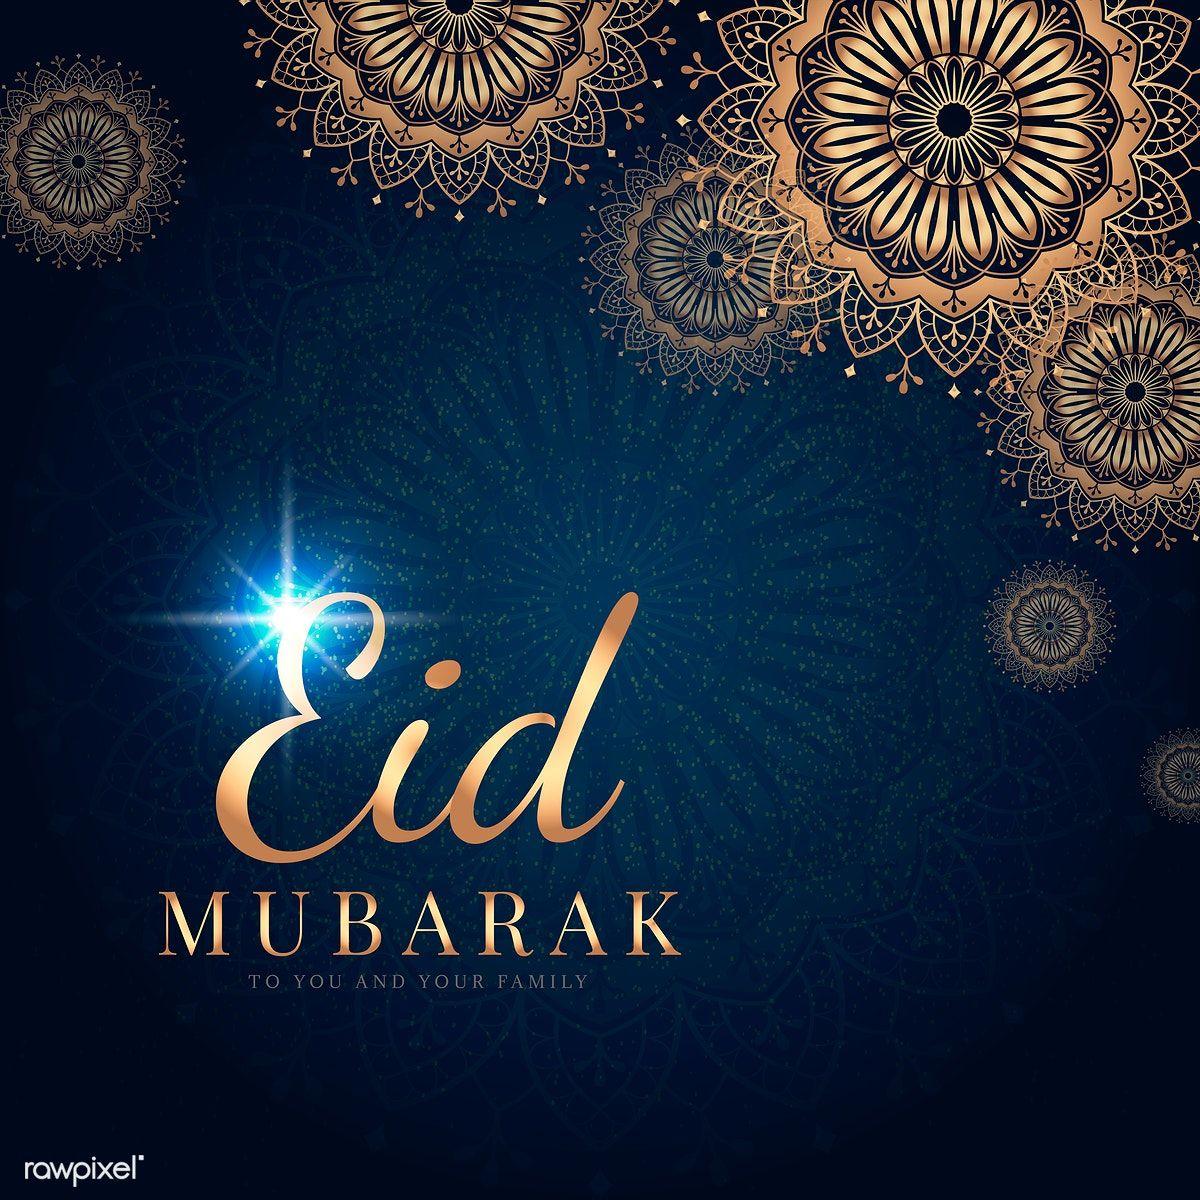 Download Premium Vector Of Eid Mubarak Card With Mandala Pattern Eid Mubarak Card Eid Mubarak Images Eid Mubarak Wishes Images